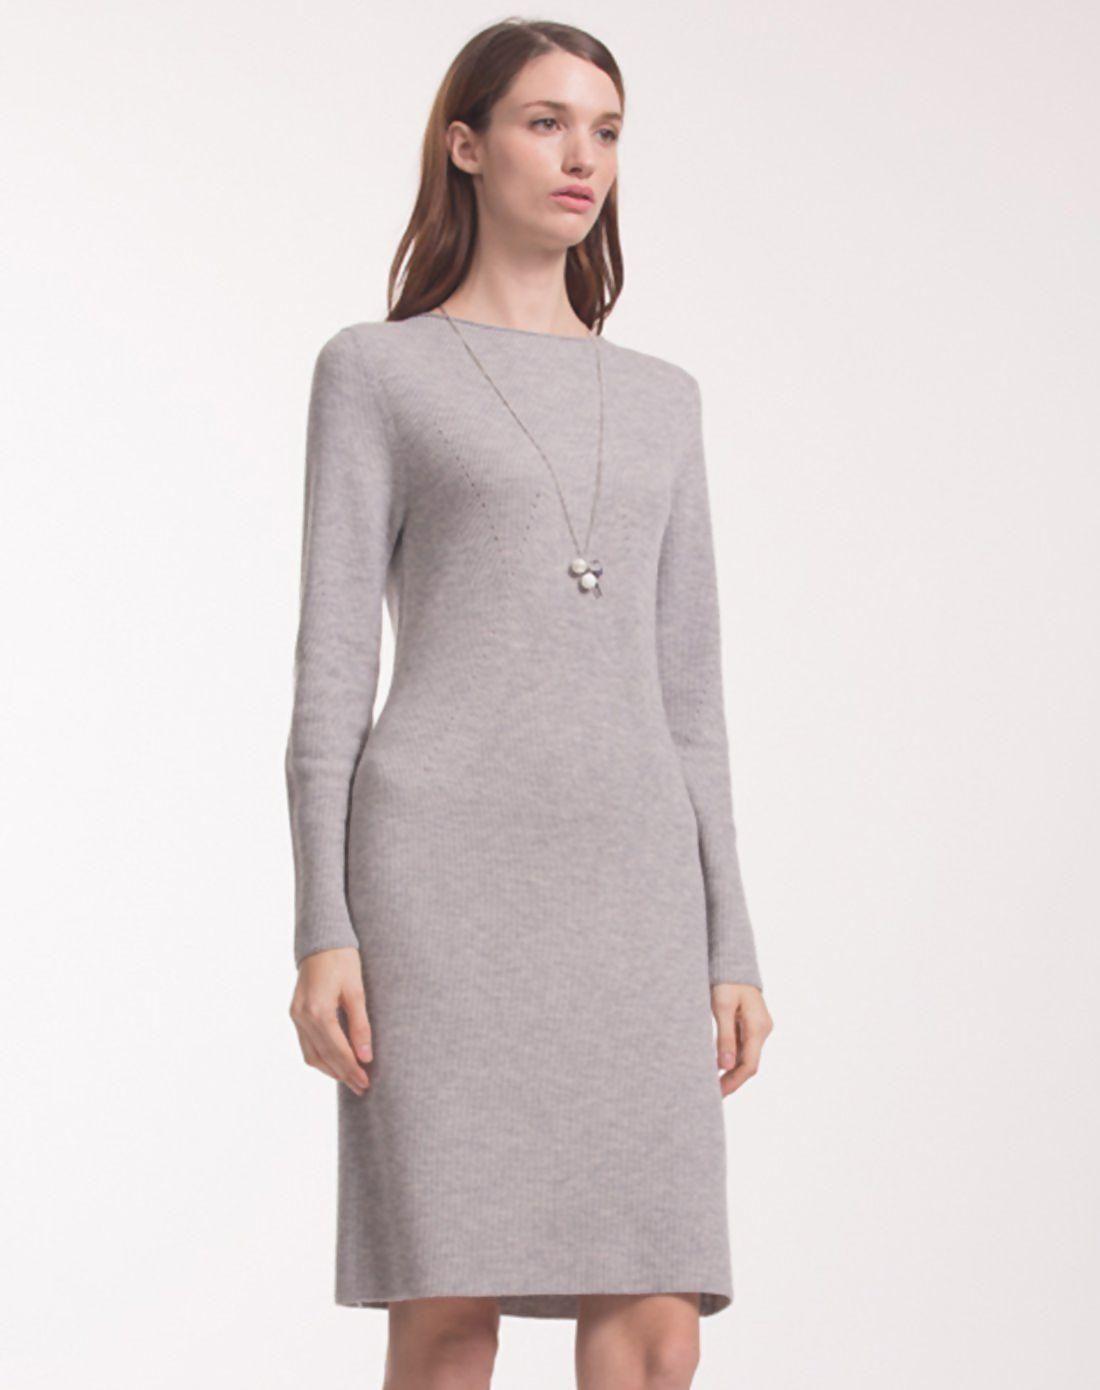 #mothersday #AdoreWe #VIPshop Womens - naivee Gray Round Neck Long Sleeve  Basic 3/4 Length Women's Shift Dress - AdoreWe.com